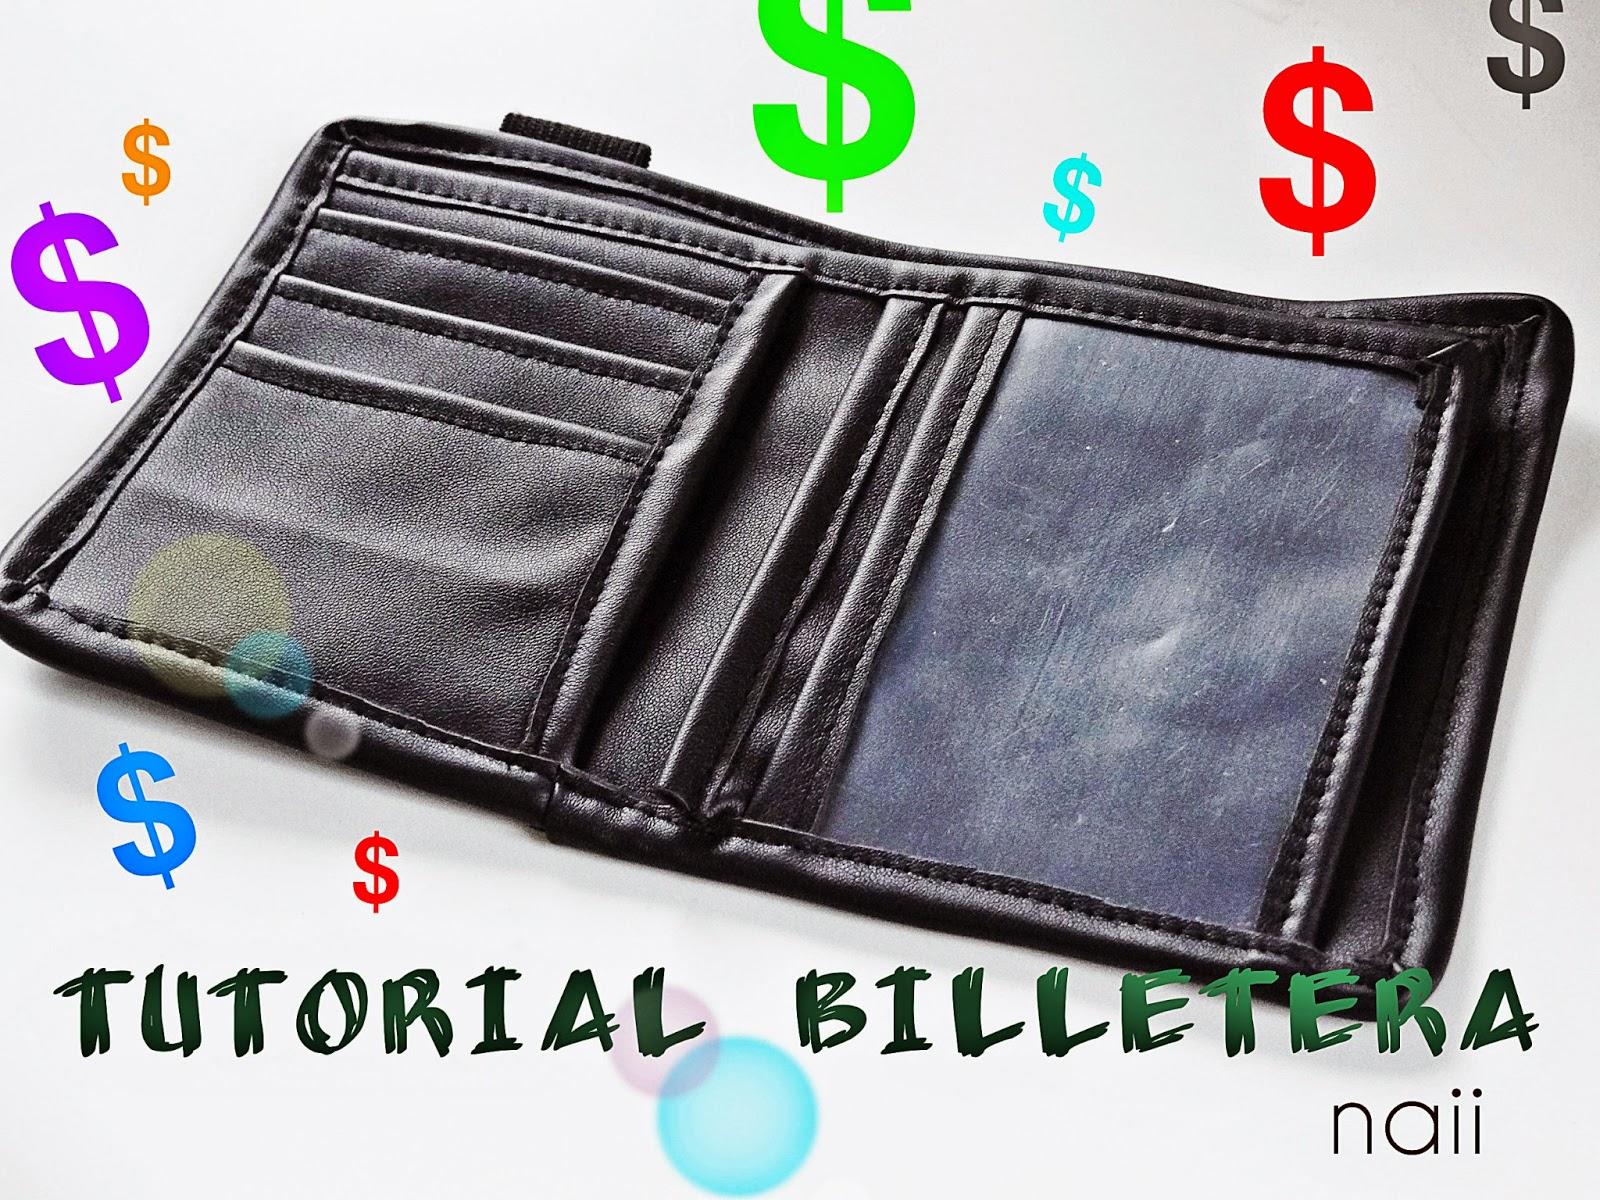 8b8998ff1 Tutorial + patron billetera - Naii Costura y Patronaje